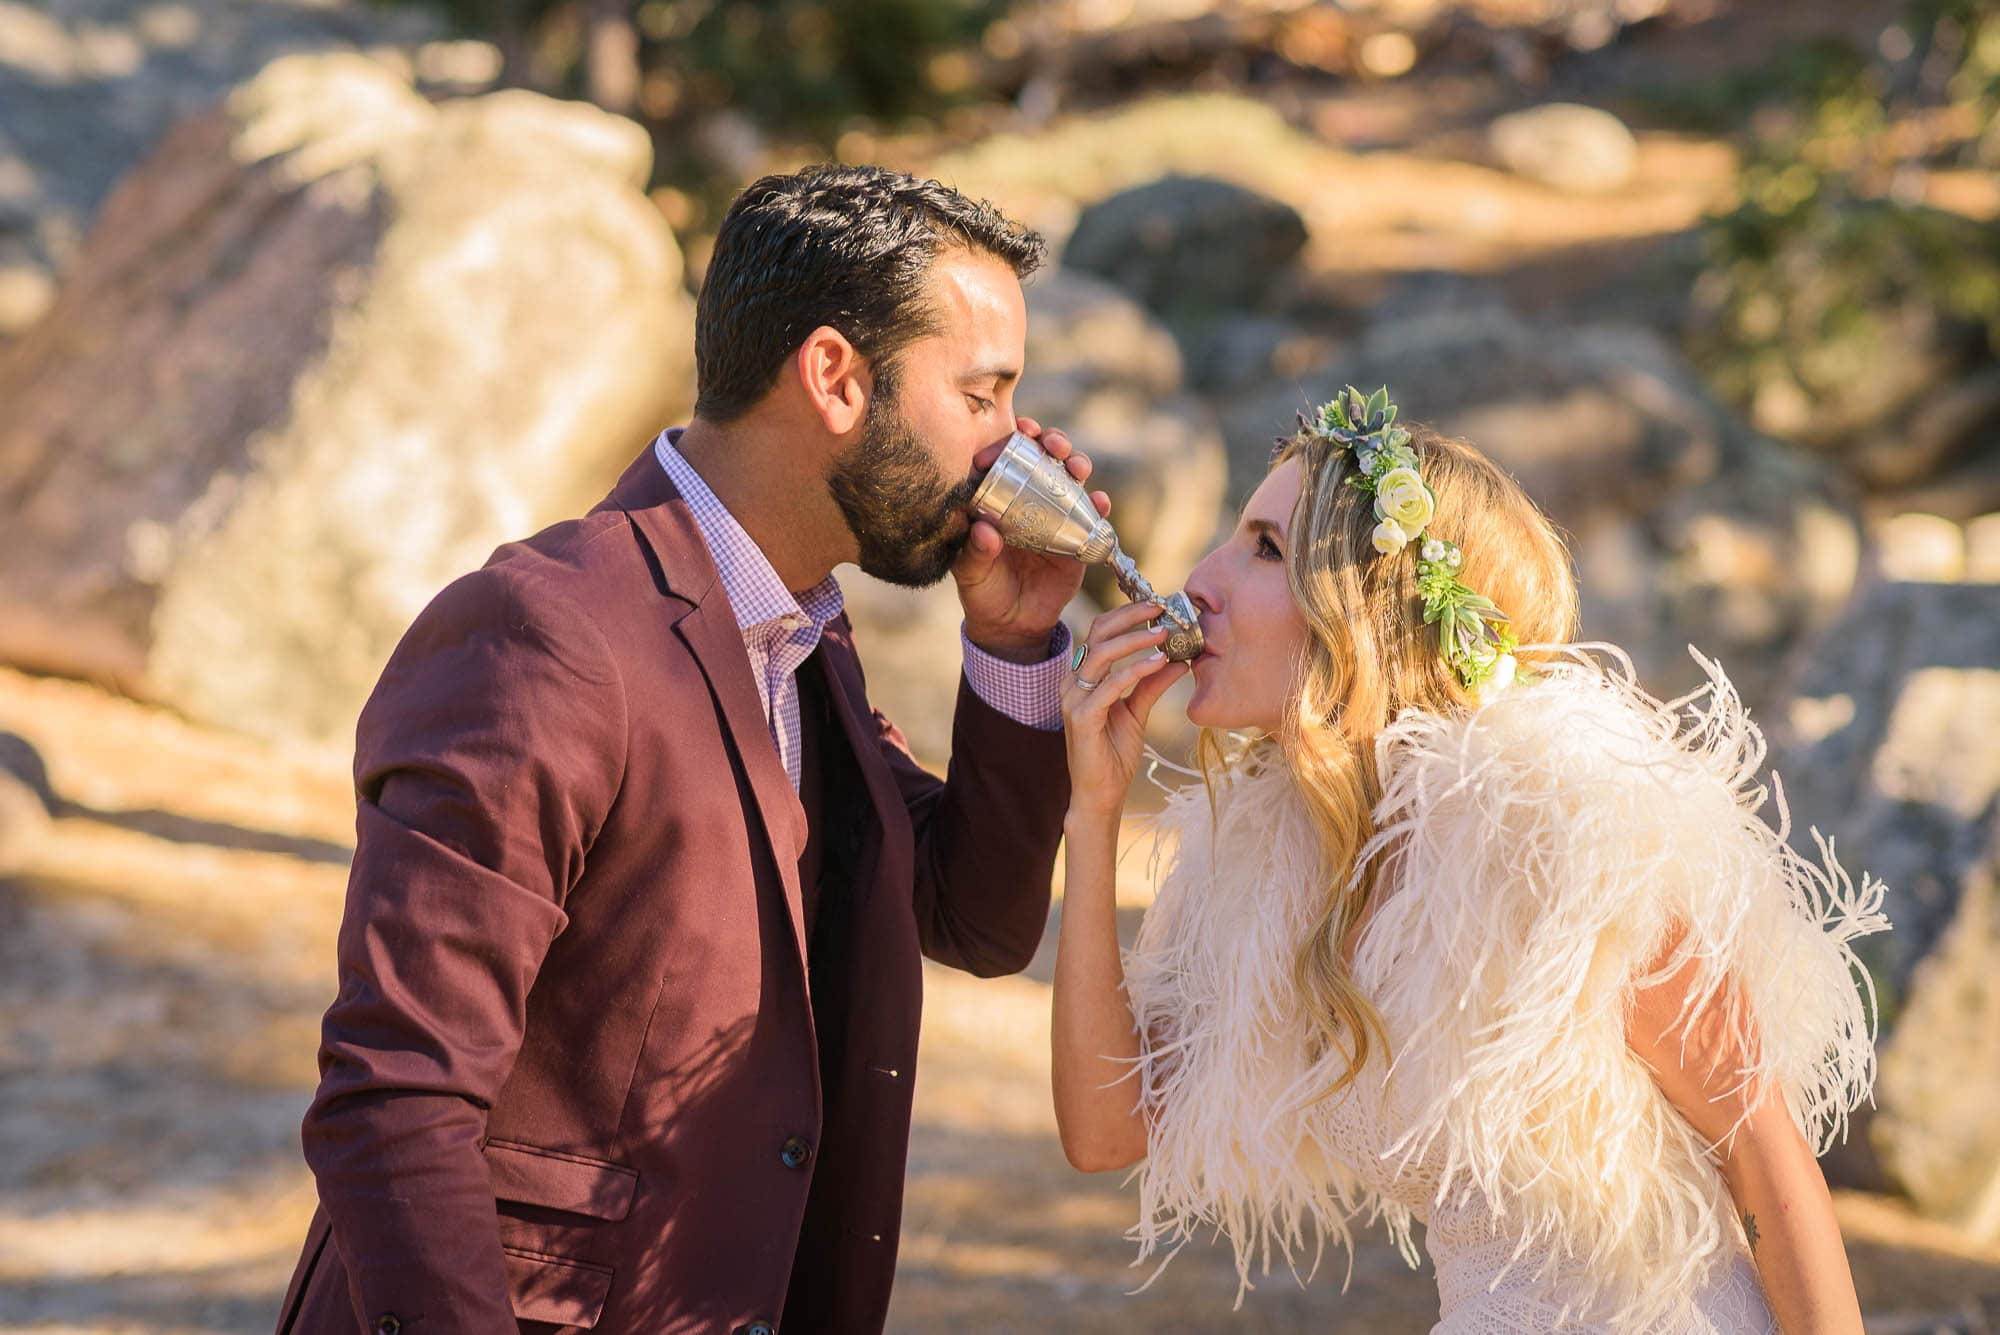 027_Alan_and_Heidi_Wedding_Natalie_Mike